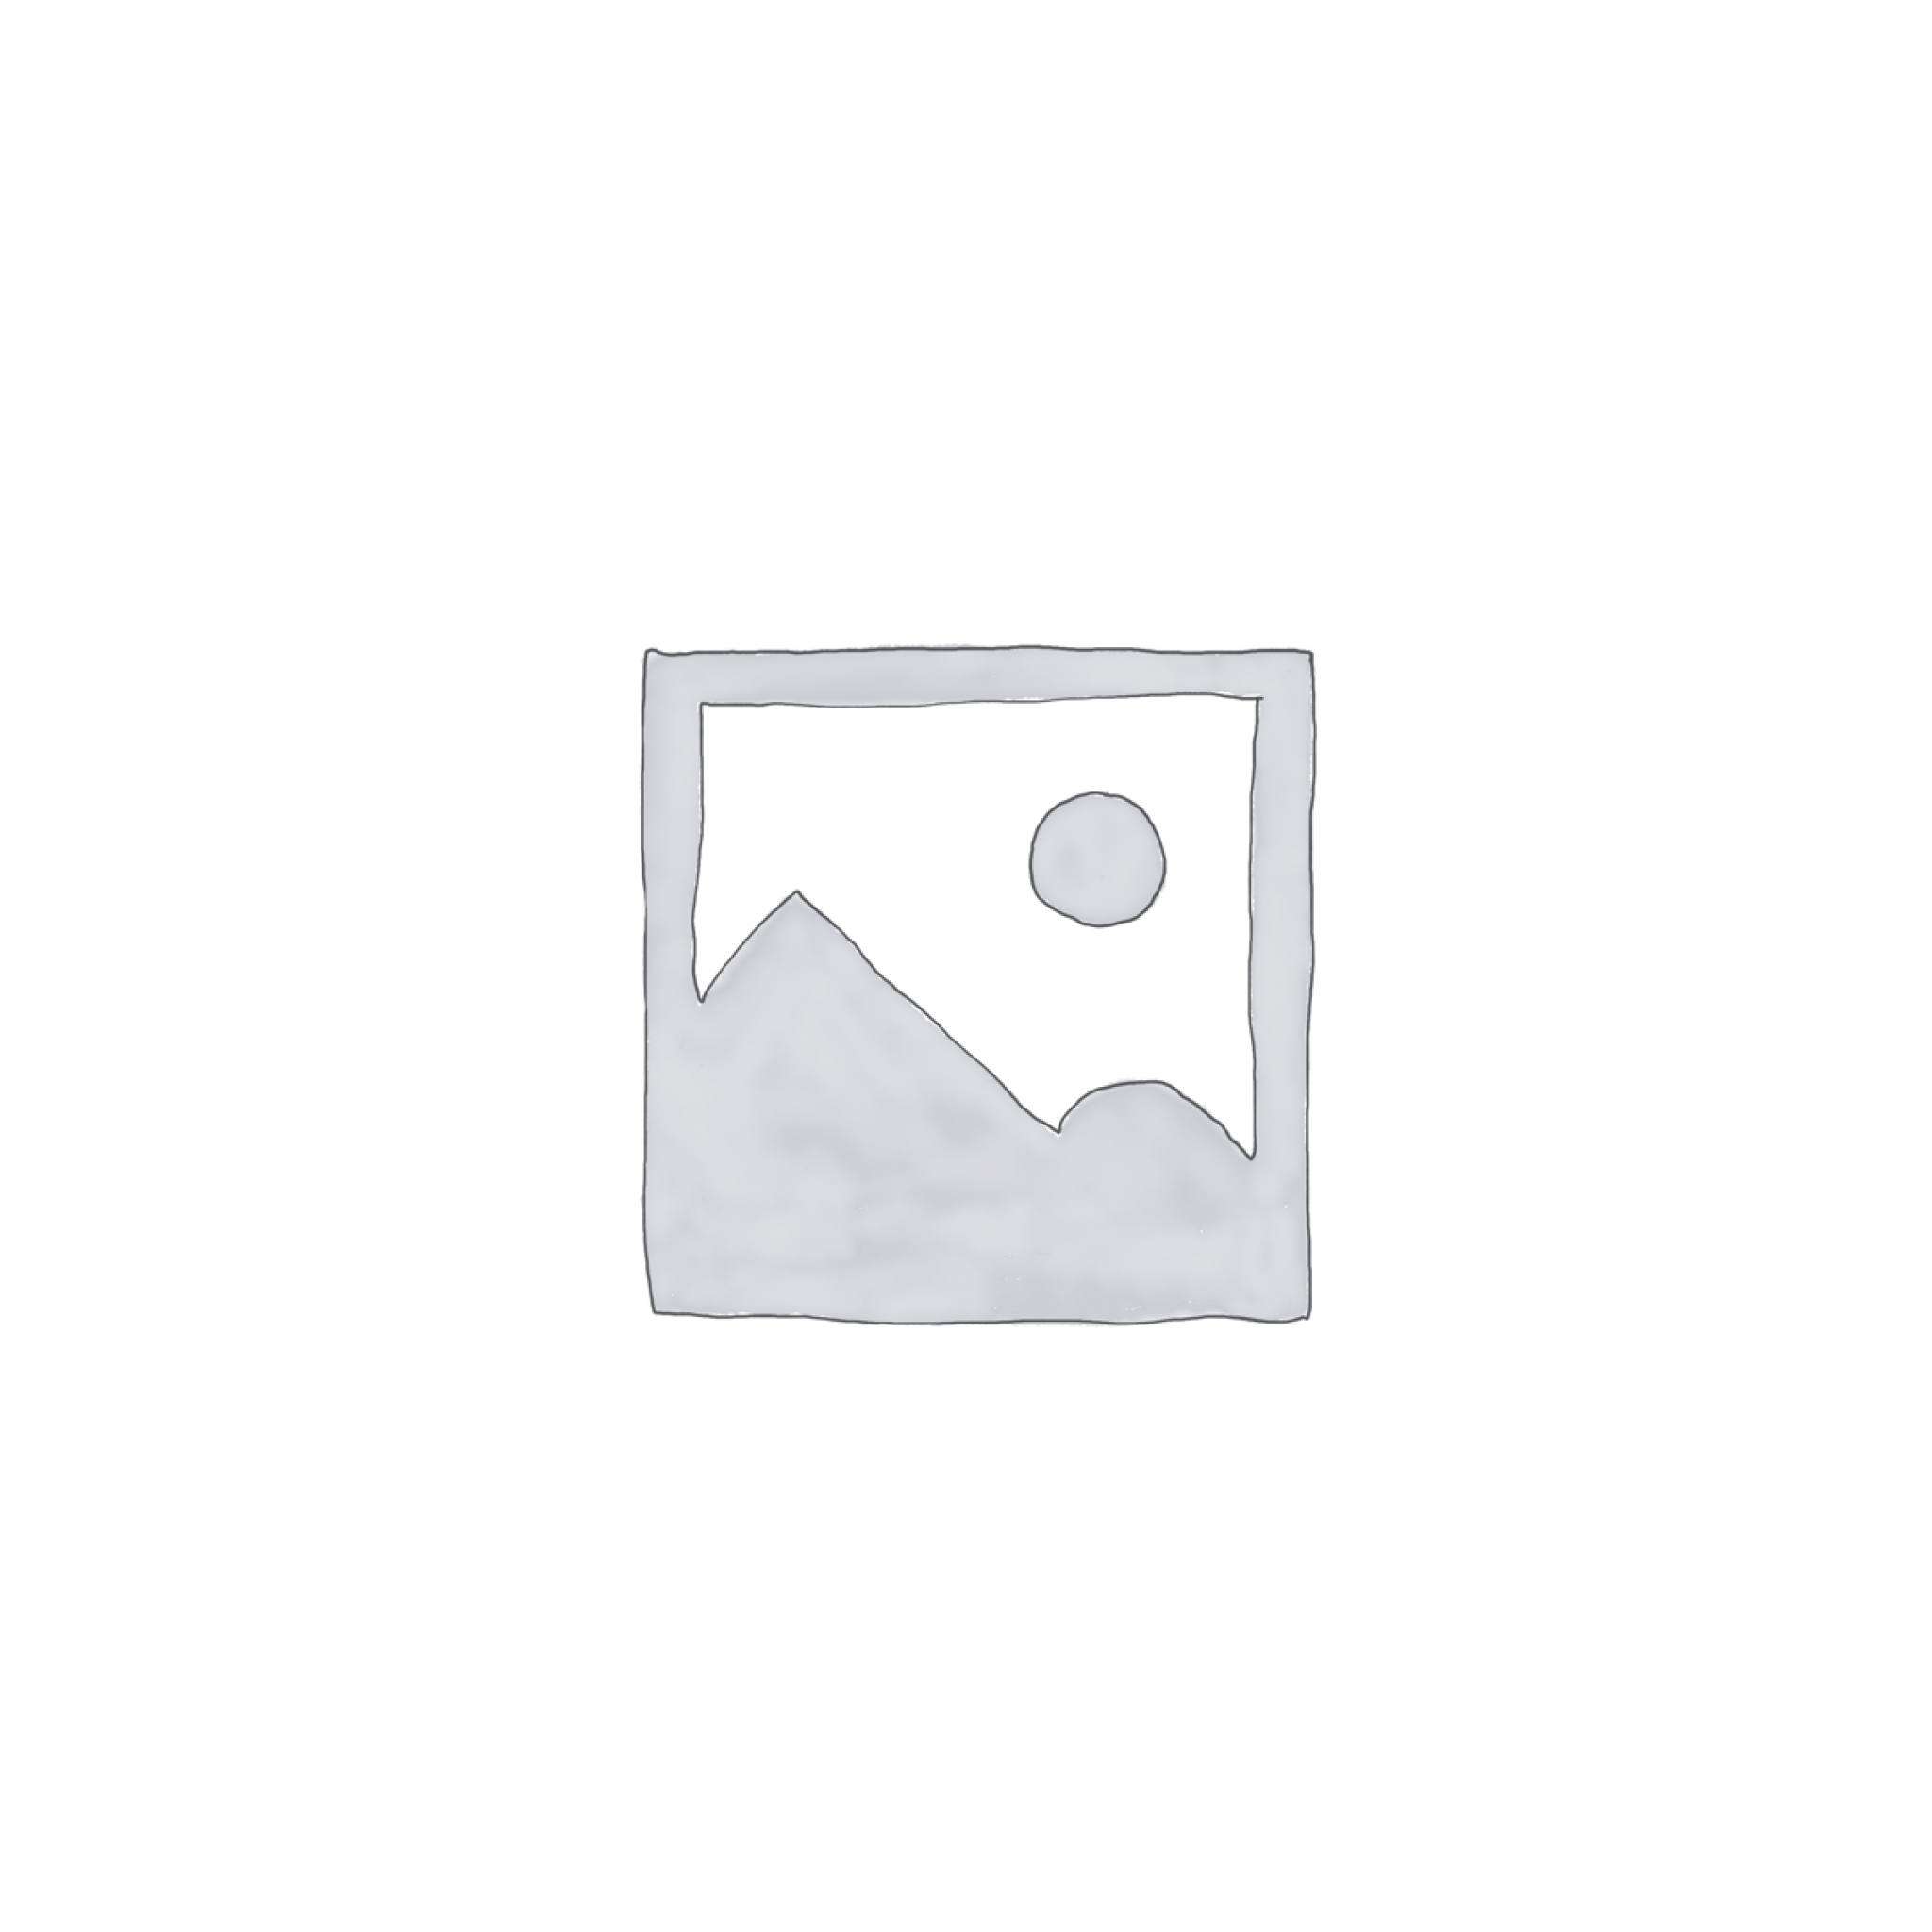 woocommerce-placeholder-2048x2048